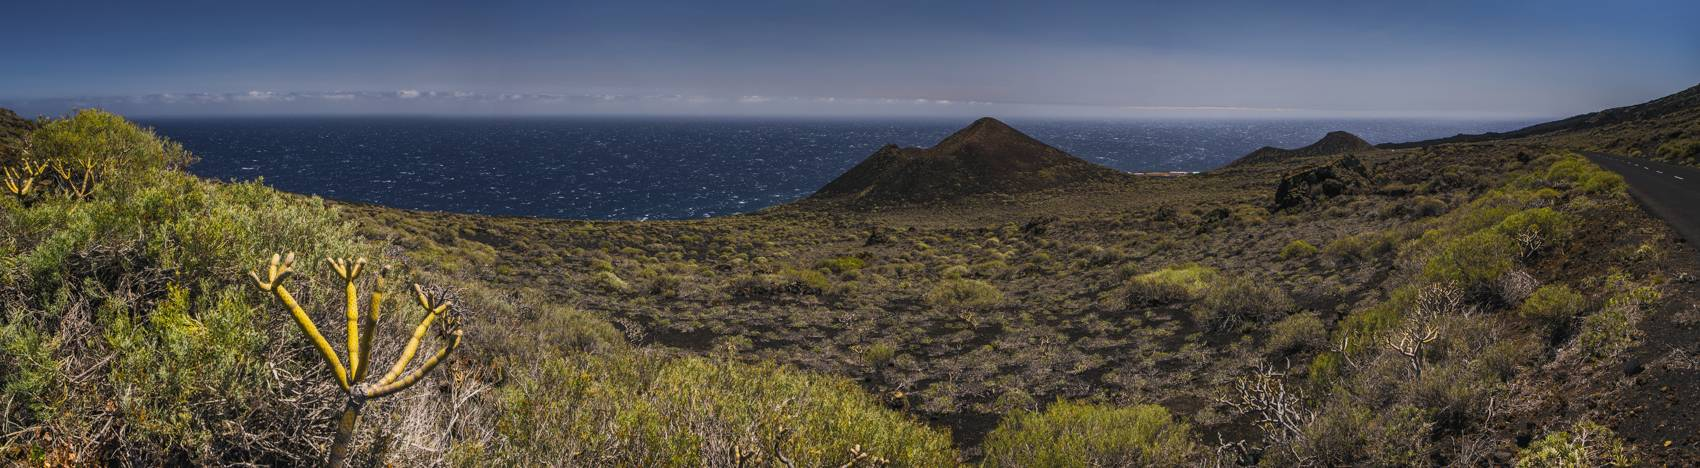 Photo Voyages : Îles Canaries #25